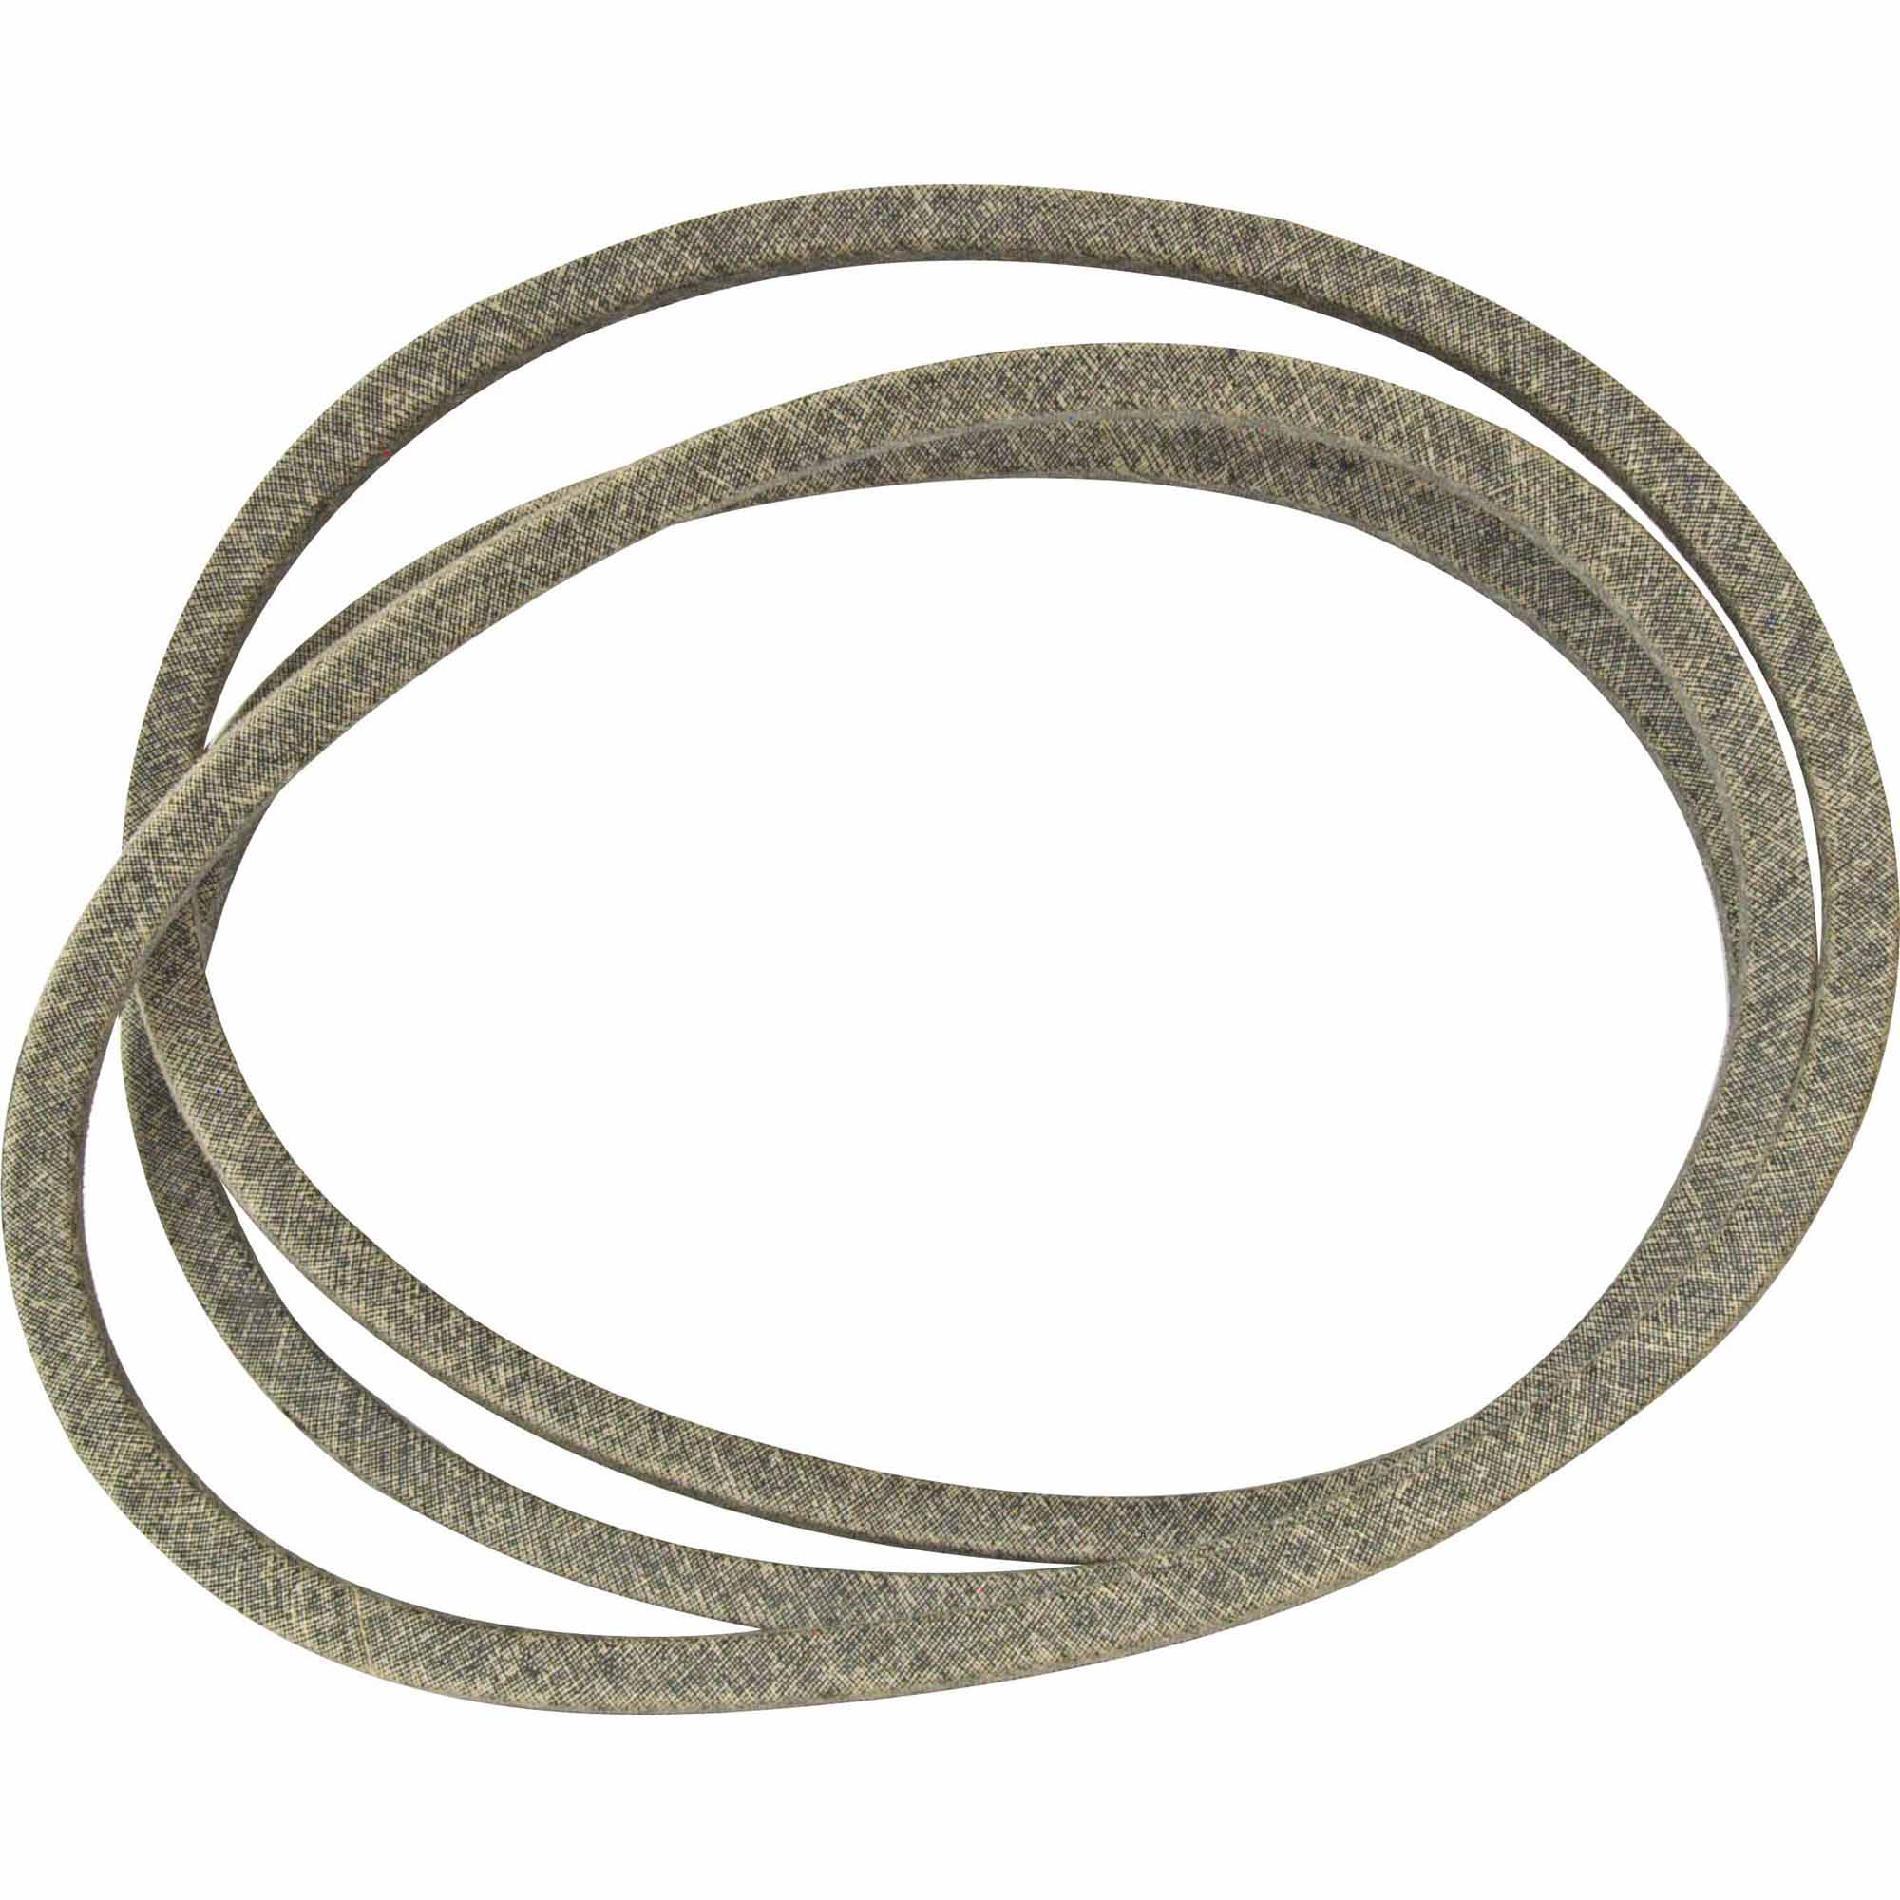 Craftsman Secondary Drive Belt